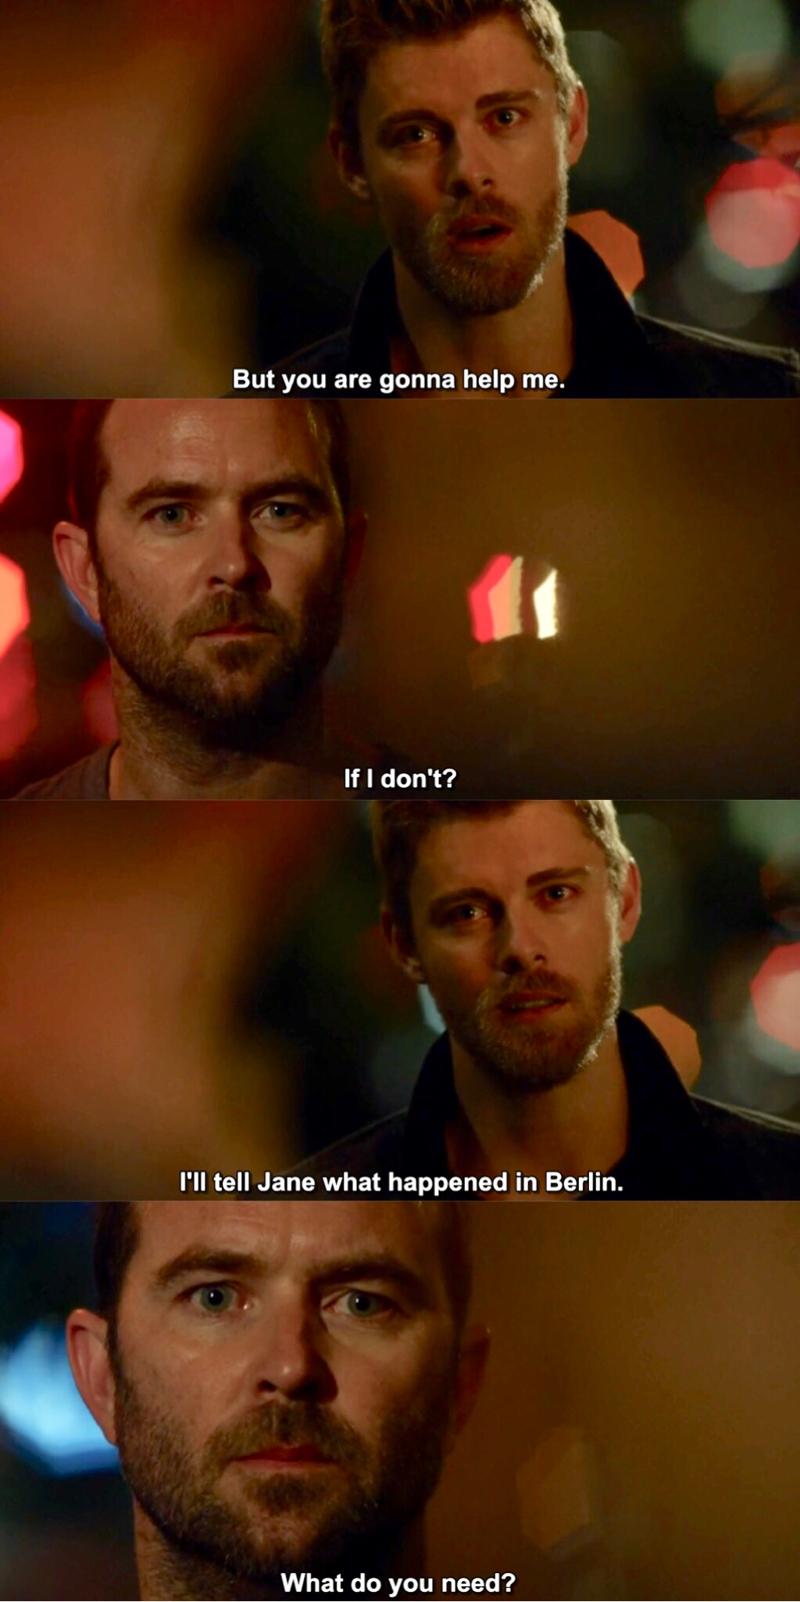 What happened in Berlin???